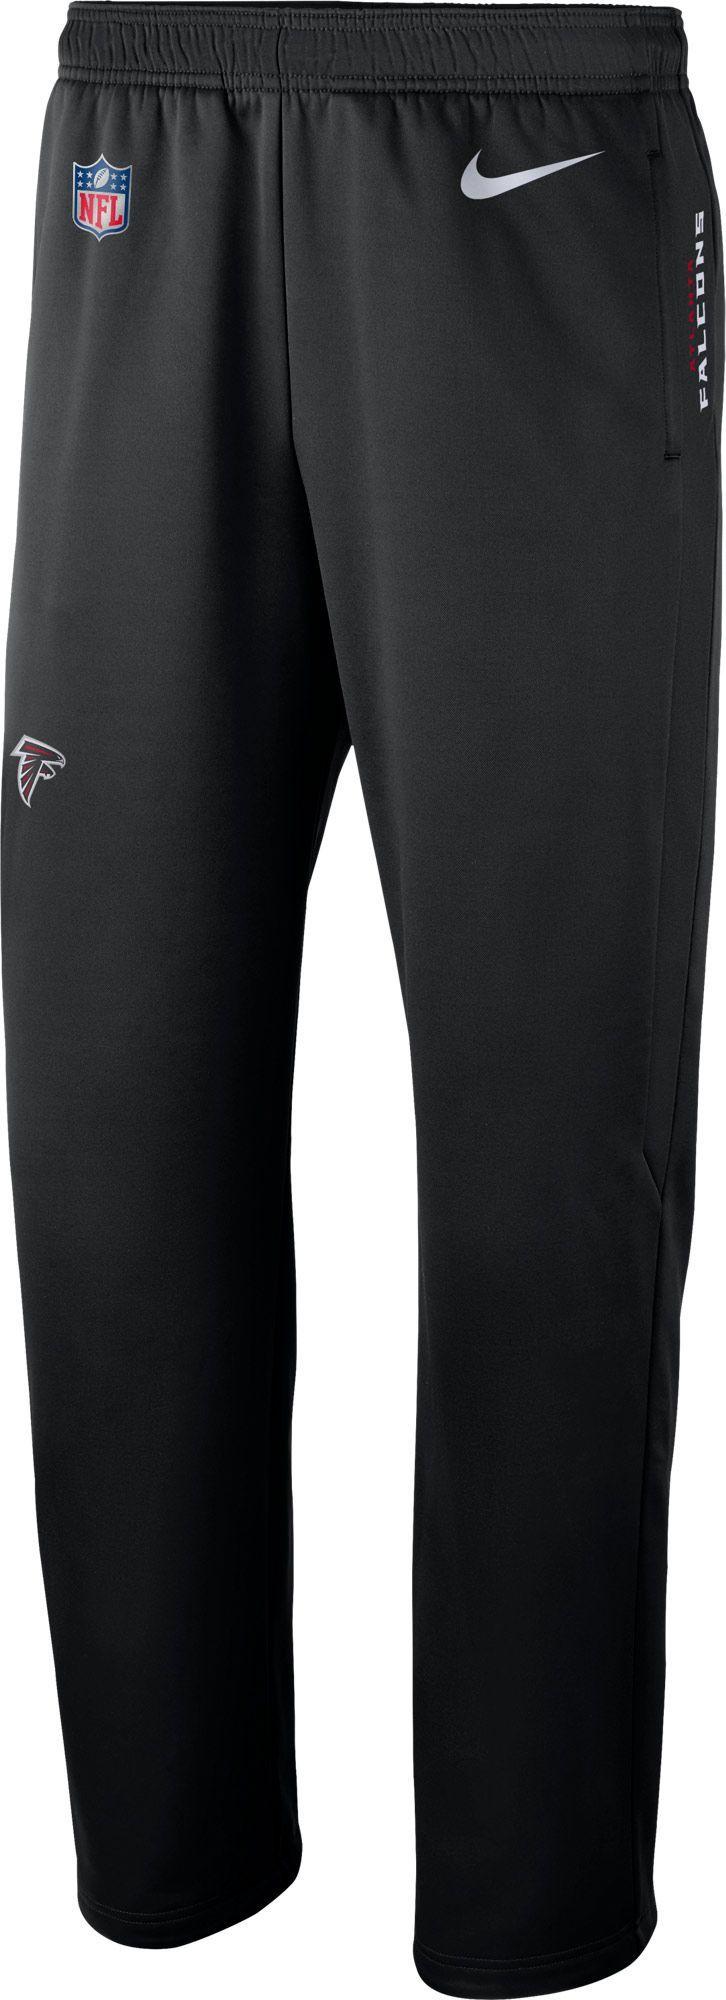 06bcfc0e49a4 Nike Men s Atlanta Sideline Therma-FIT Black Performance Pants